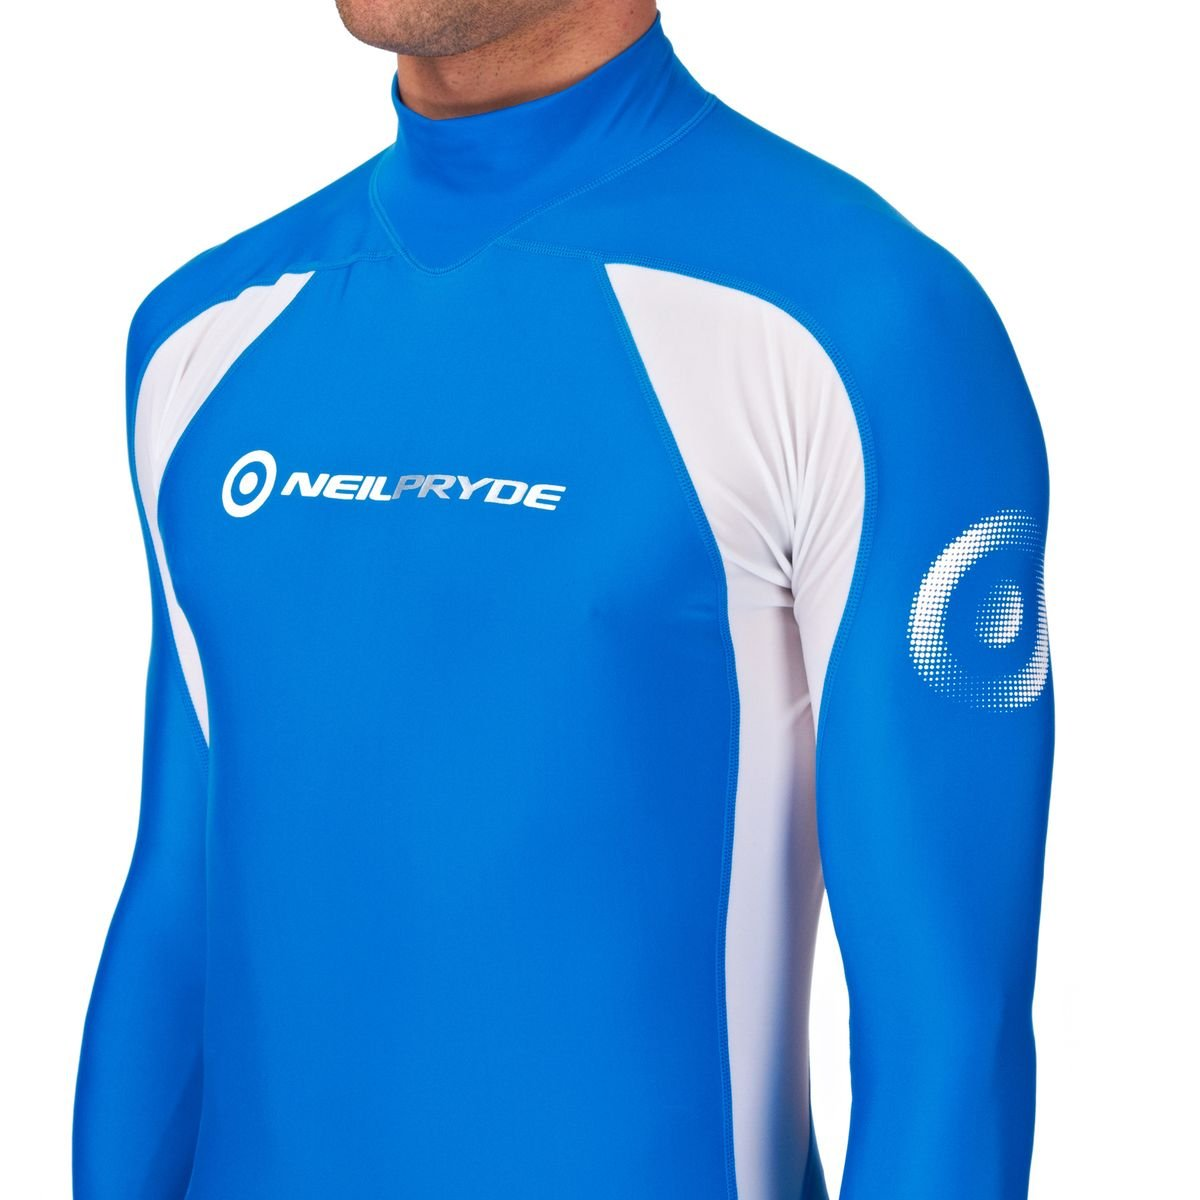 Neil Pryde Elite Rashguard Blue//White